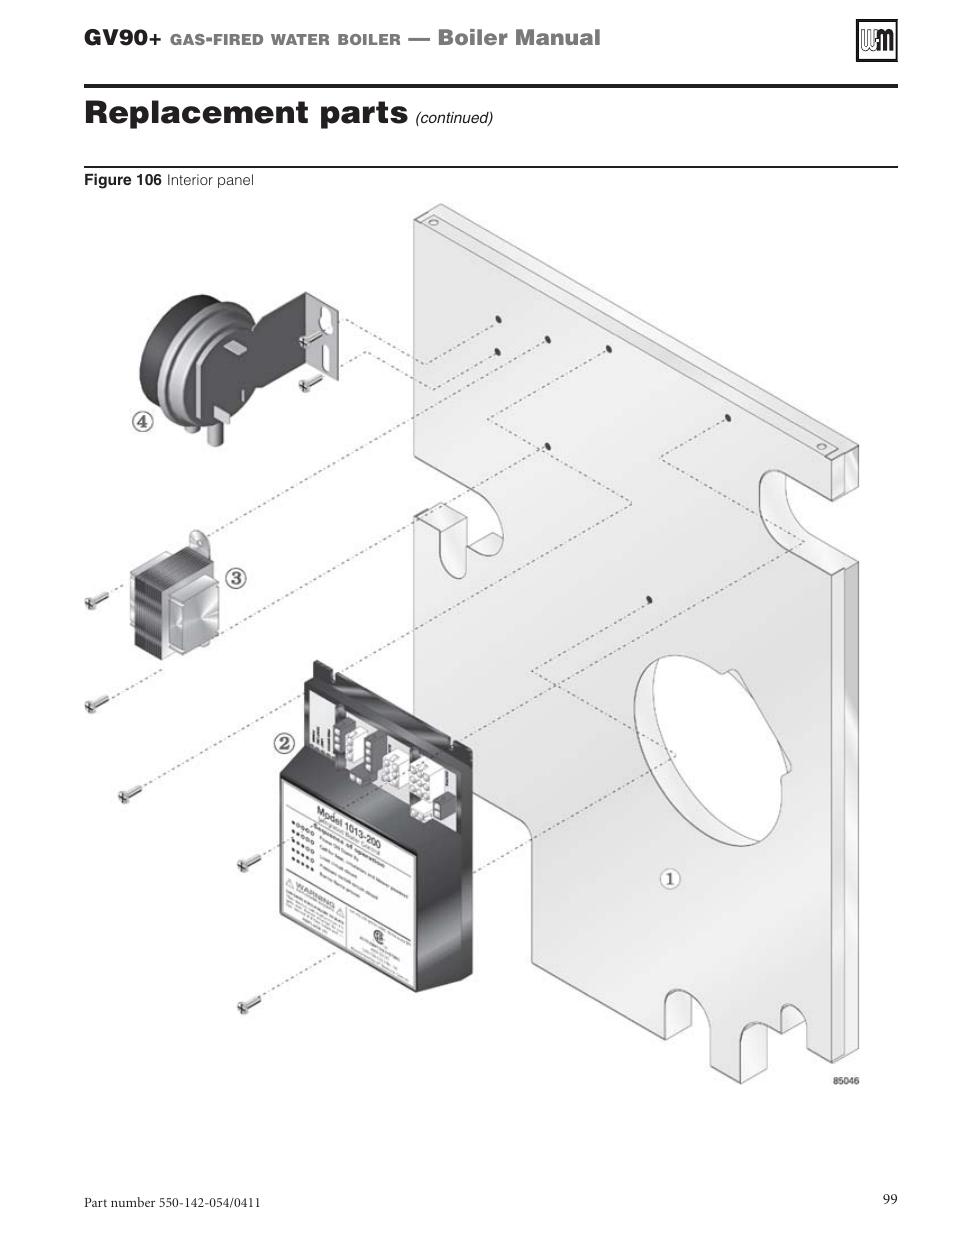 Weil Mclain Boiler Manuals Wiring Diagram